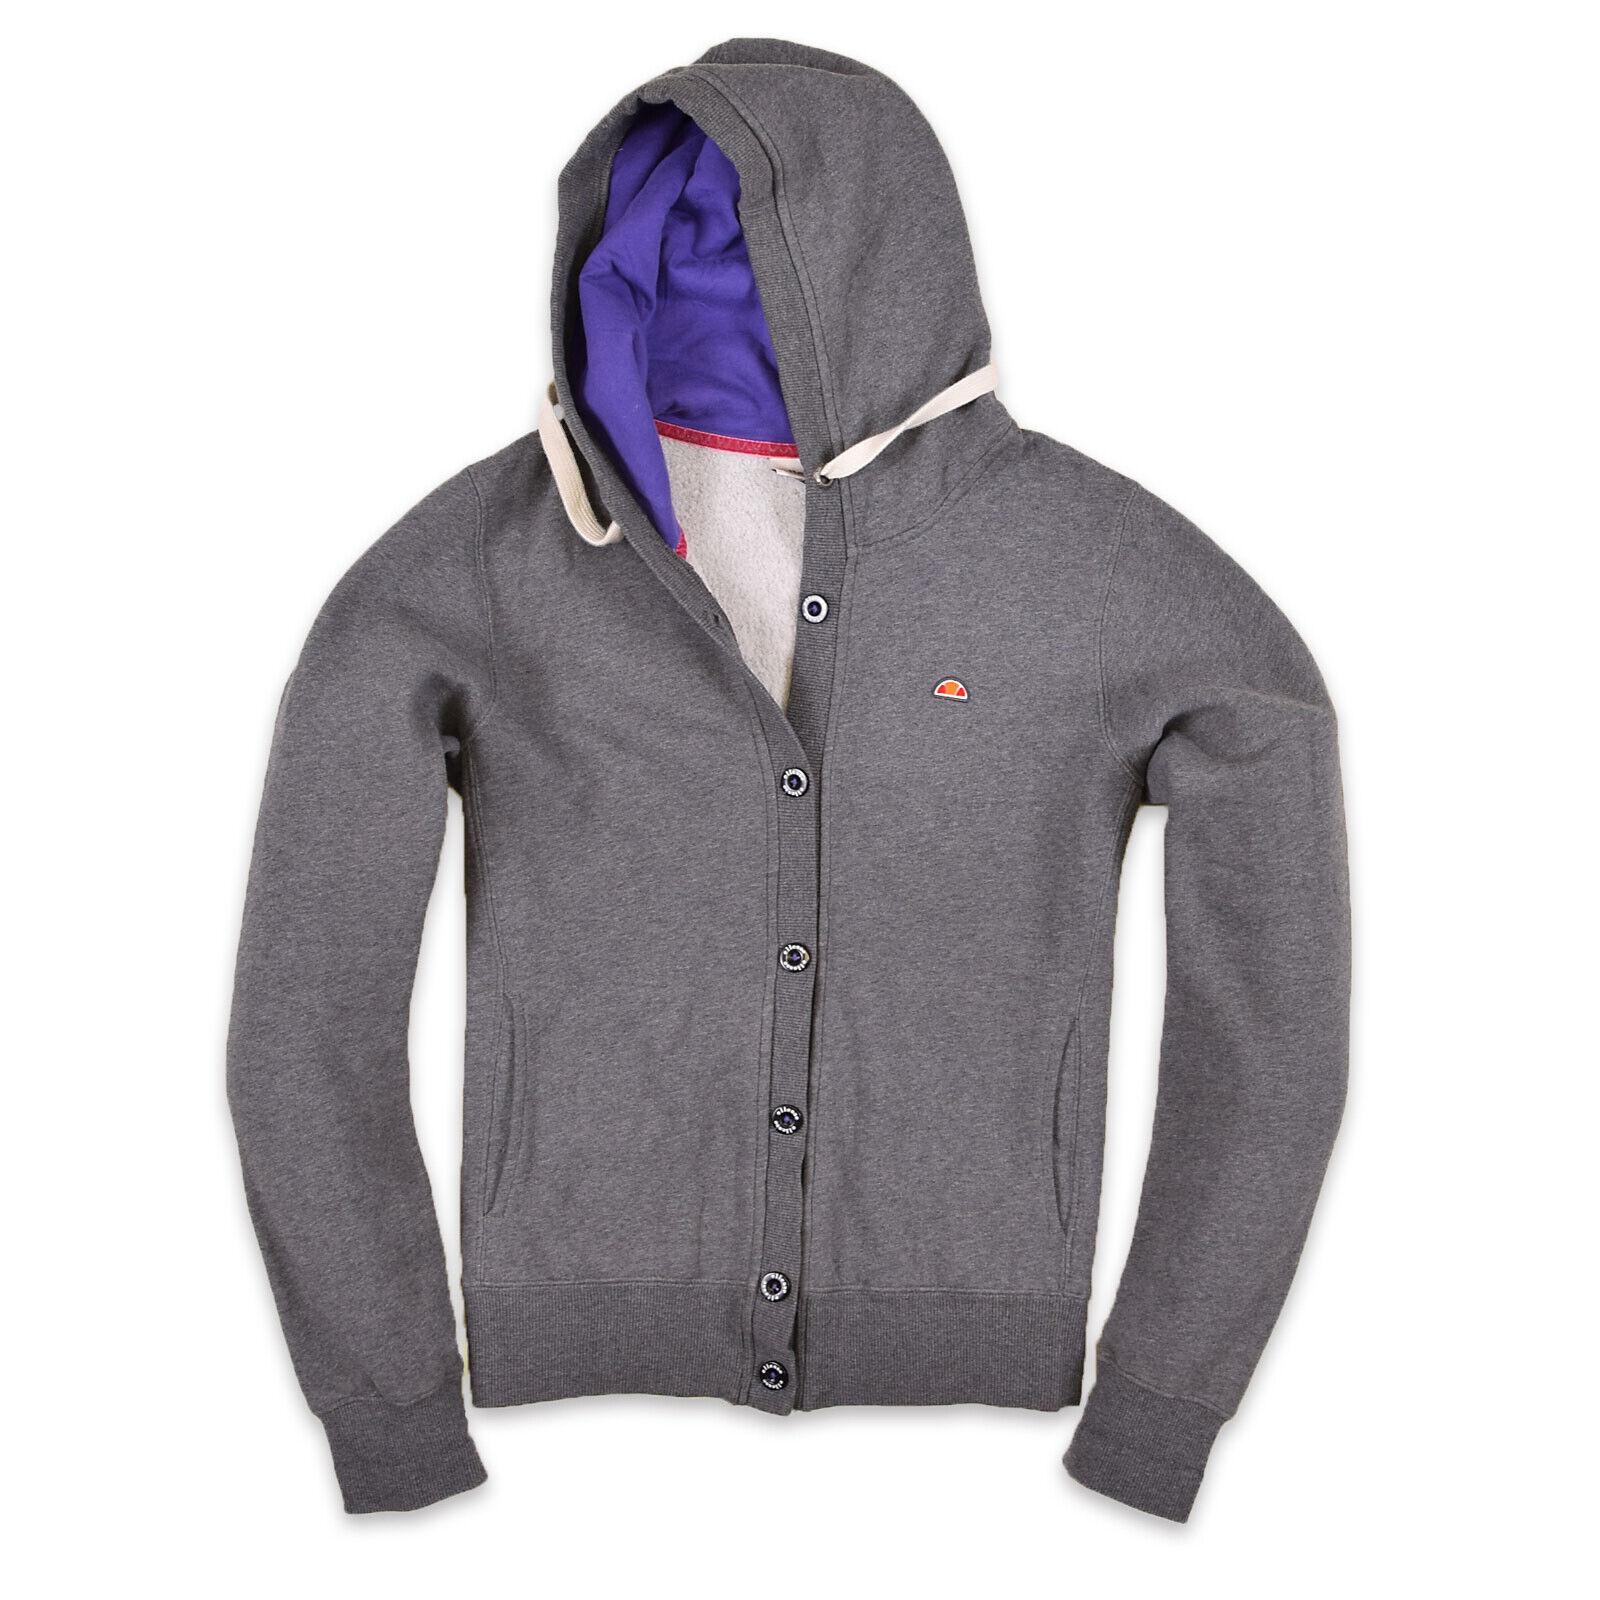 Ellesse Damen Sweatshirt Kapuzenpullover Gr.16 (DE 44) Jacke Italia Grau 80100